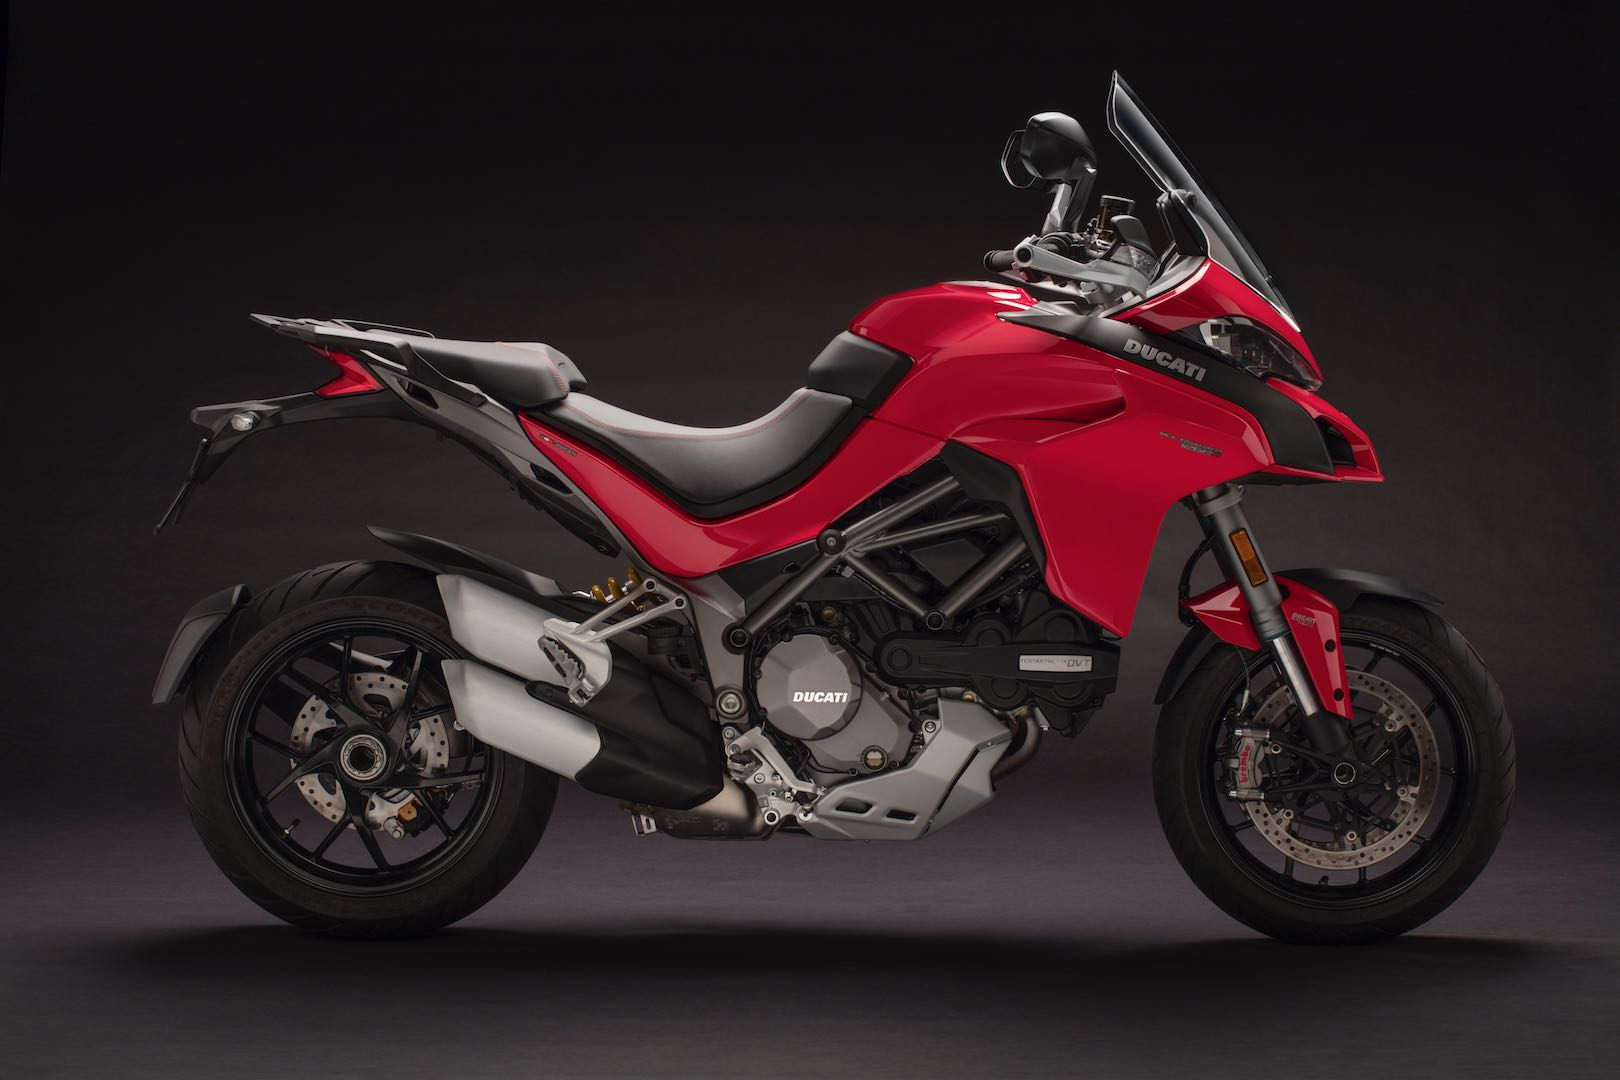 Ducati announces prices of 2018 Multistr... | Visordown